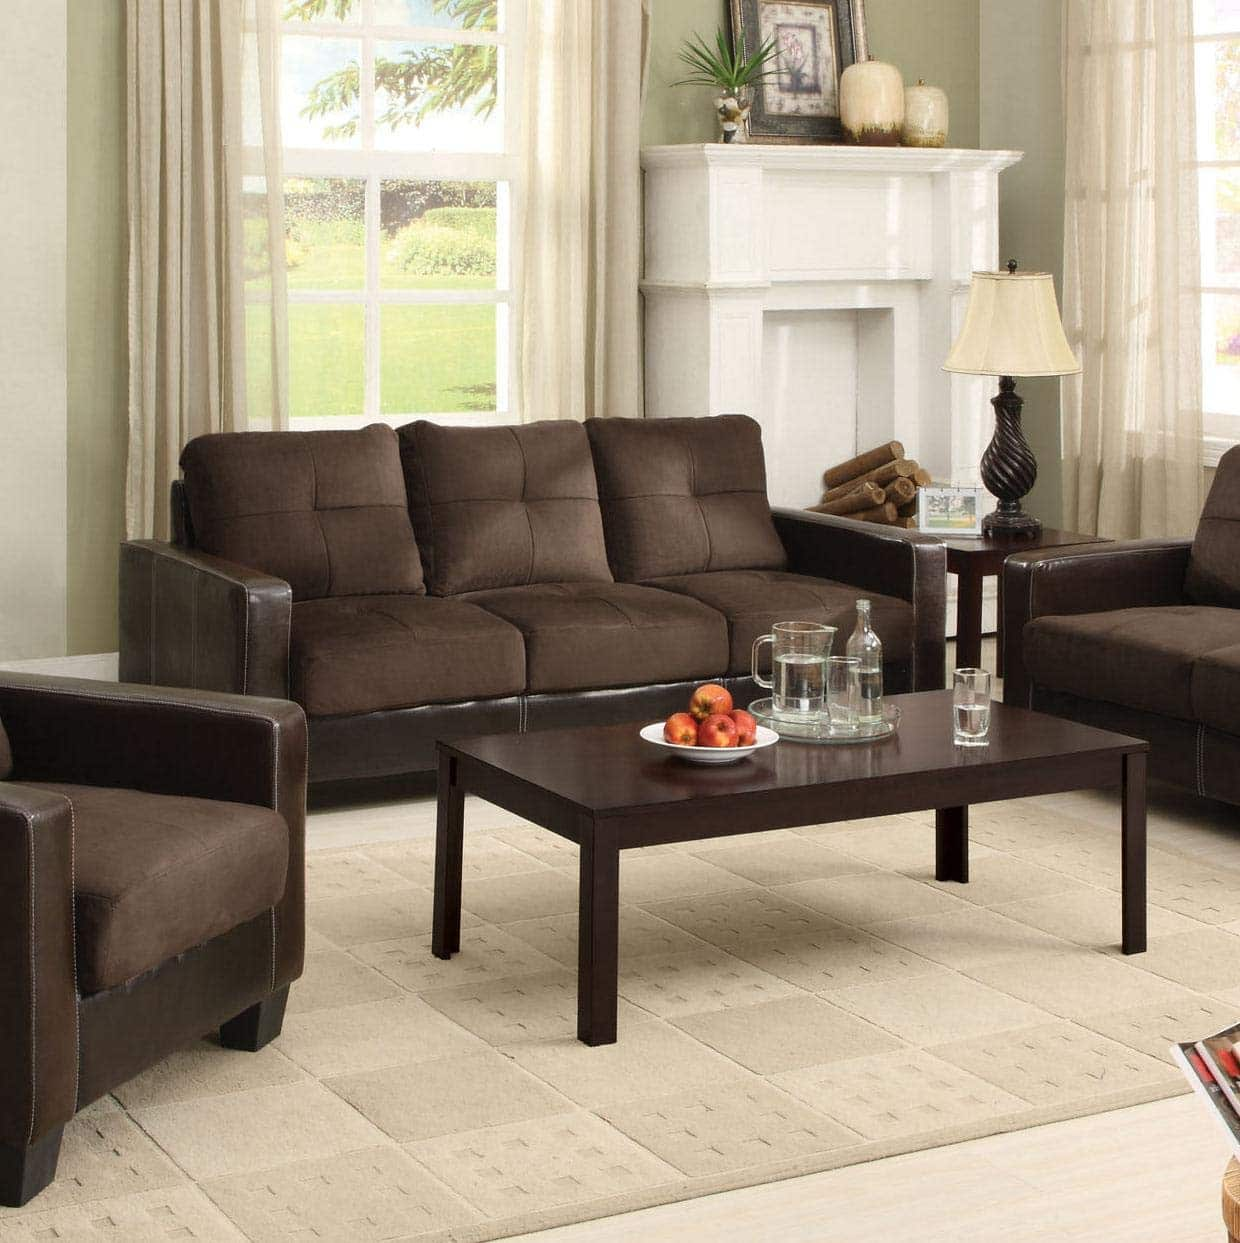 Furniture of America Laverne II Microfiber Sofa